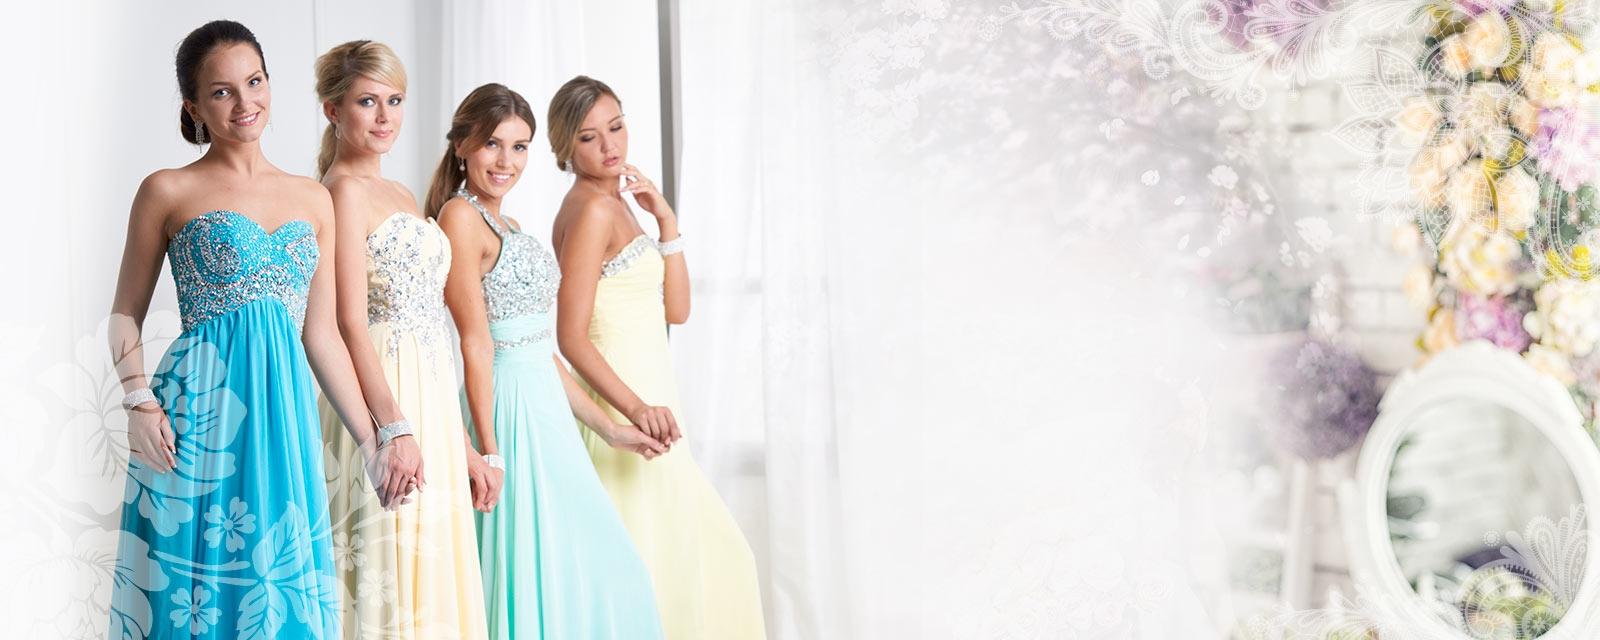 Anniversary dresses